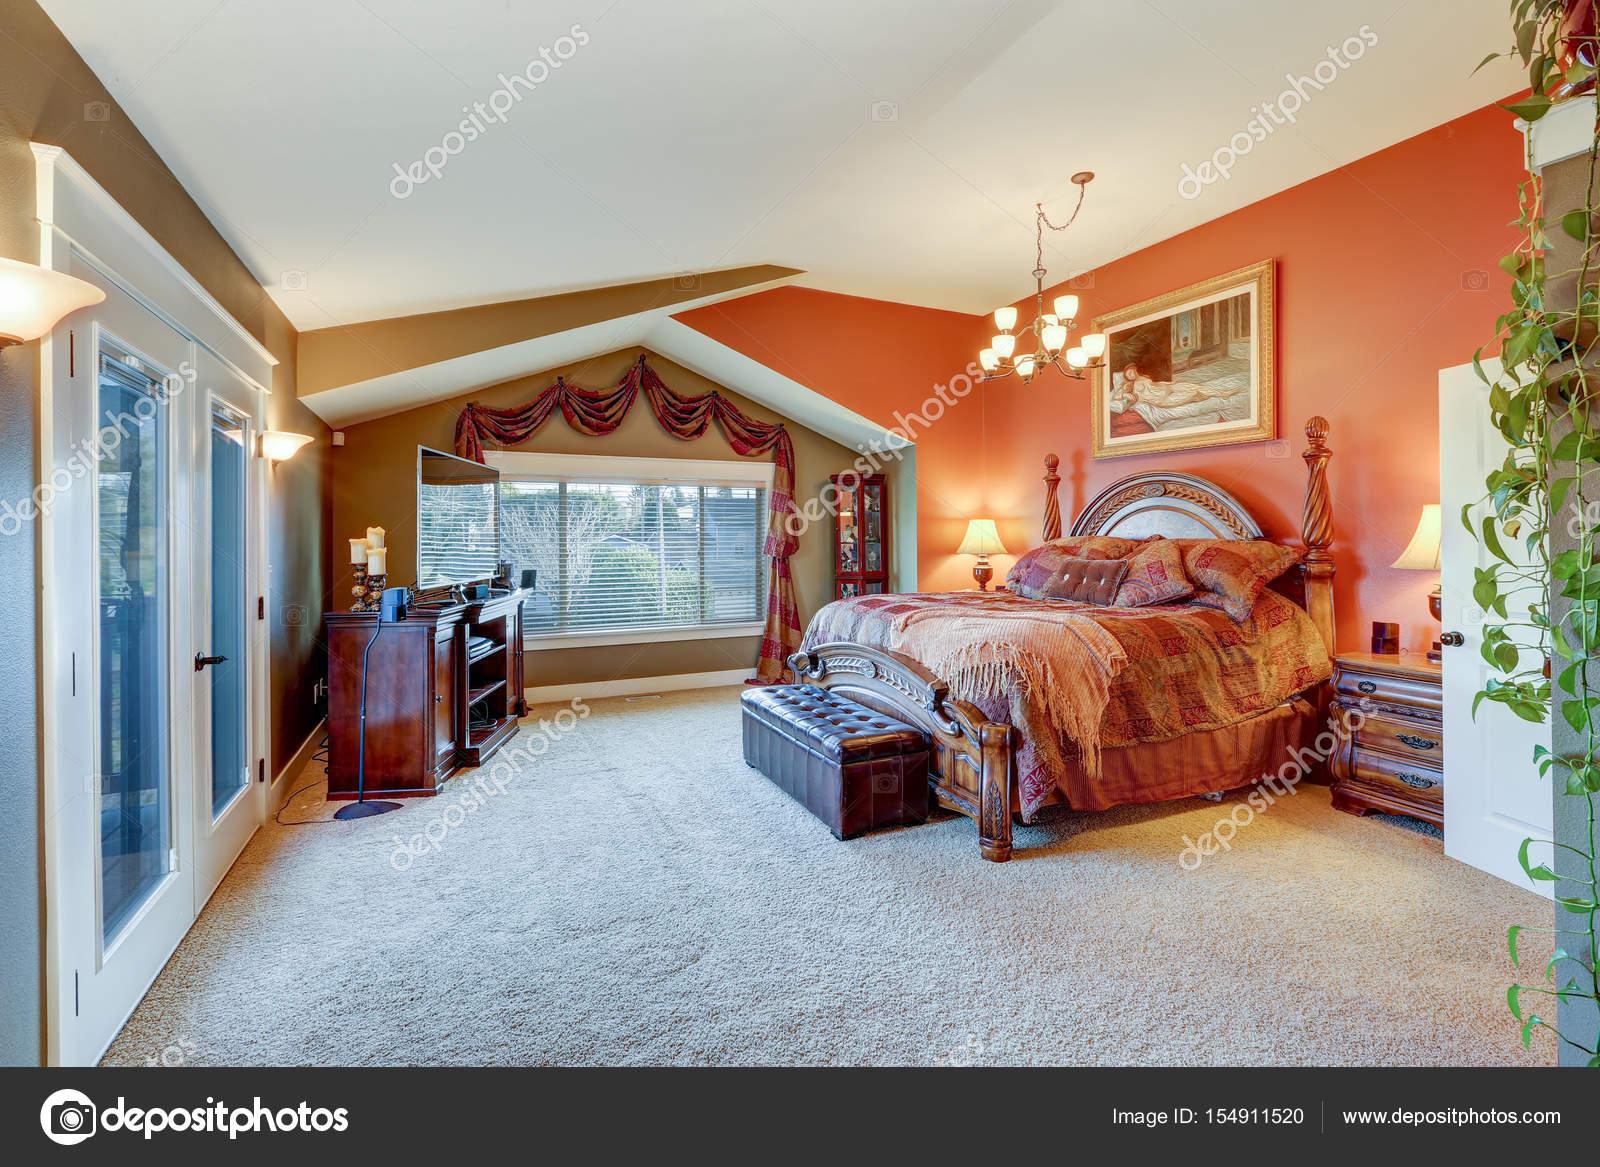 Sensational Elegant Master Suite With Red And Grey Walls Stock Photo Inzonedesignstudio Interior Chair Design Inzonedesignstudiocom